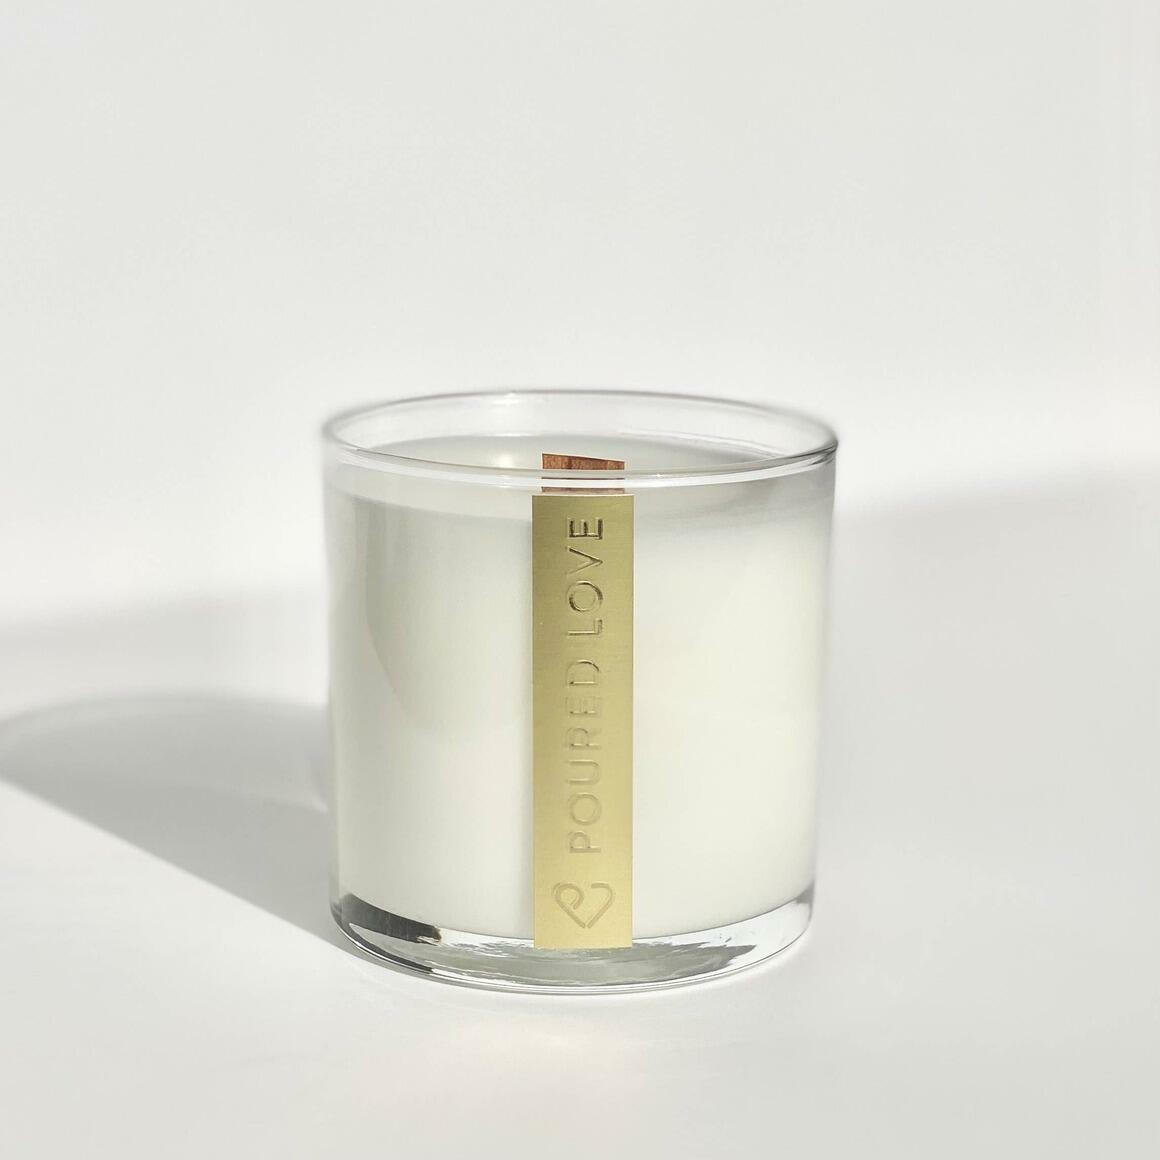 Lemon Eucalypt - Scented Candle | Trada Marketplace